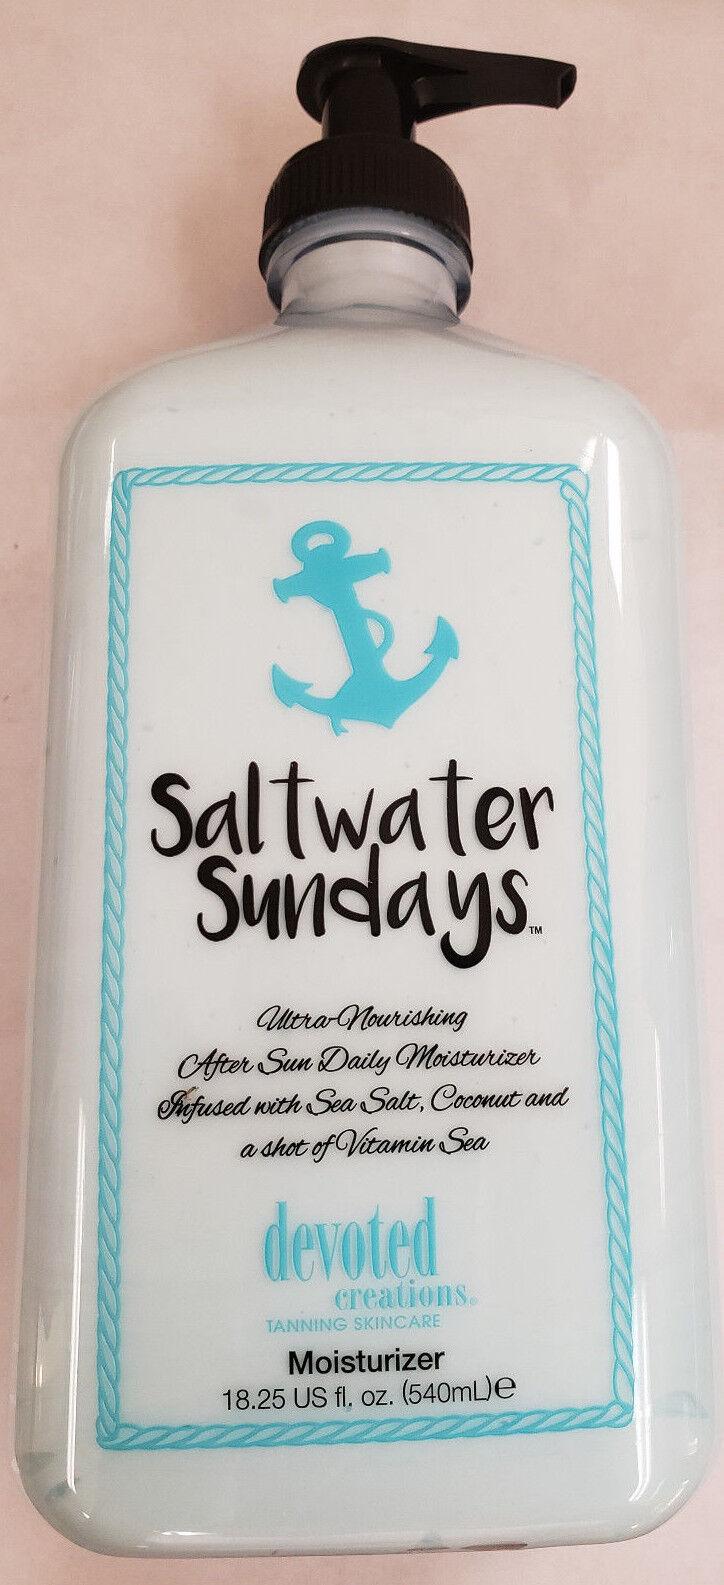 NEW 2018 Devoted Creations Saltwater Sundays Moisturizer 18.